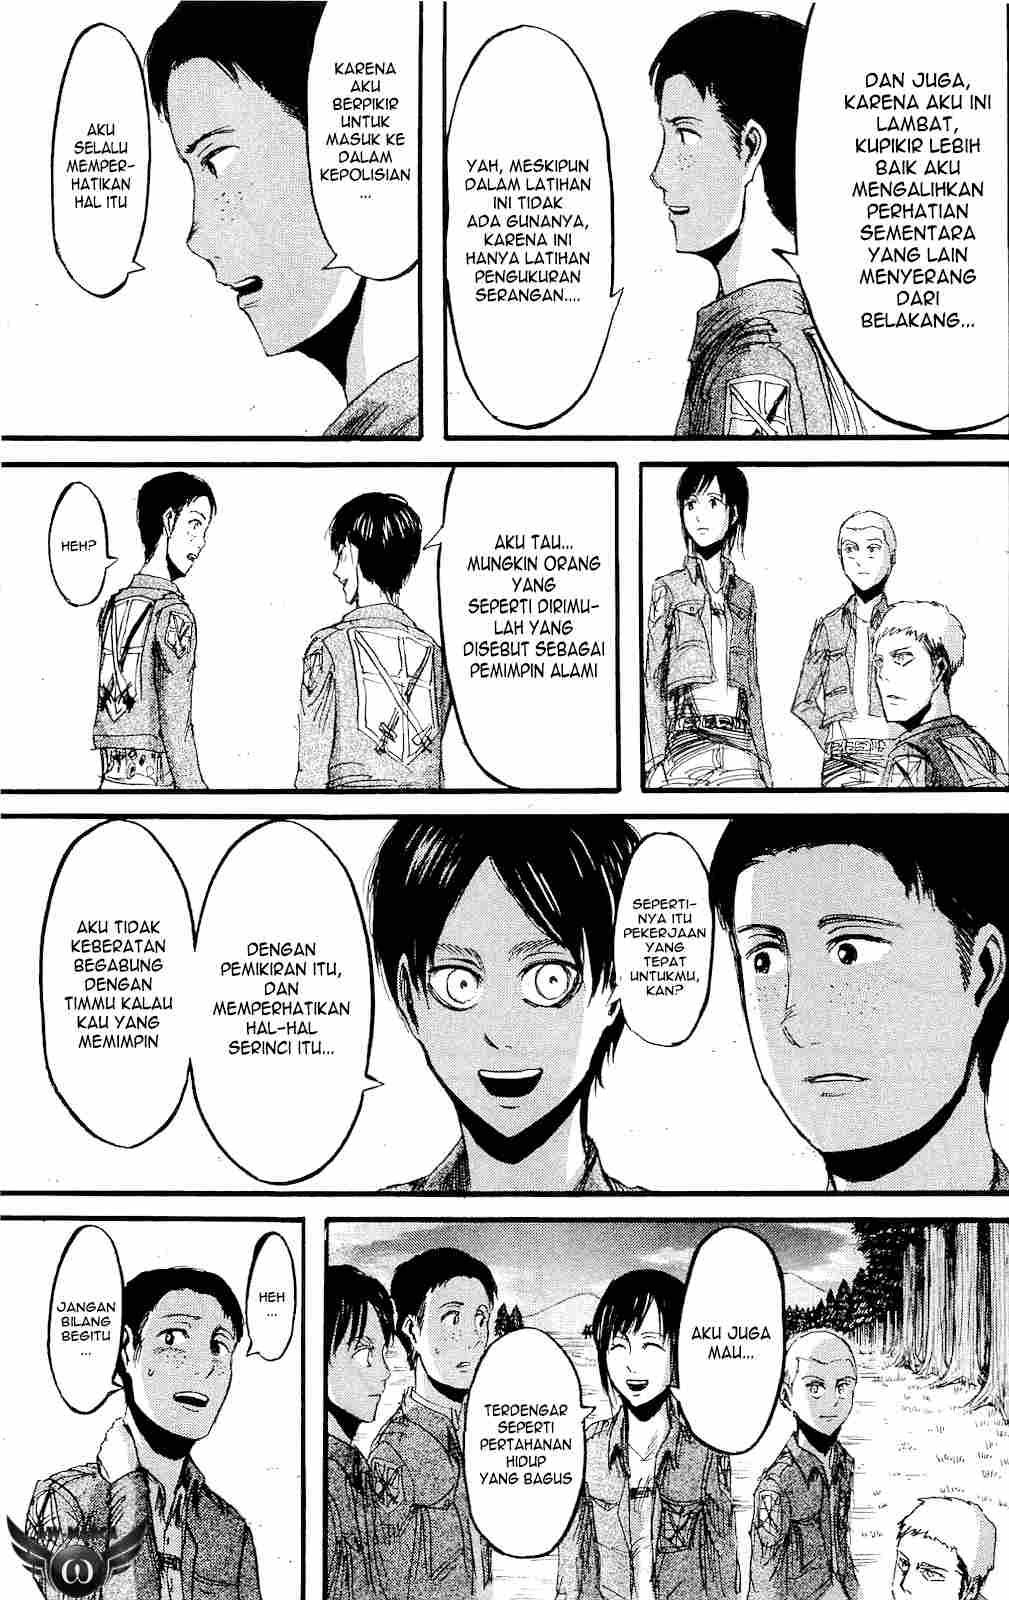 Komik shingeki no kyojin 018 - sekarang apa yang harus dilakukan 19 Indonesia shingeki no kyojin 018 - sekarang apa yang harus dilakukan Terbaru 14|Baca Manga Komik Indonesia|